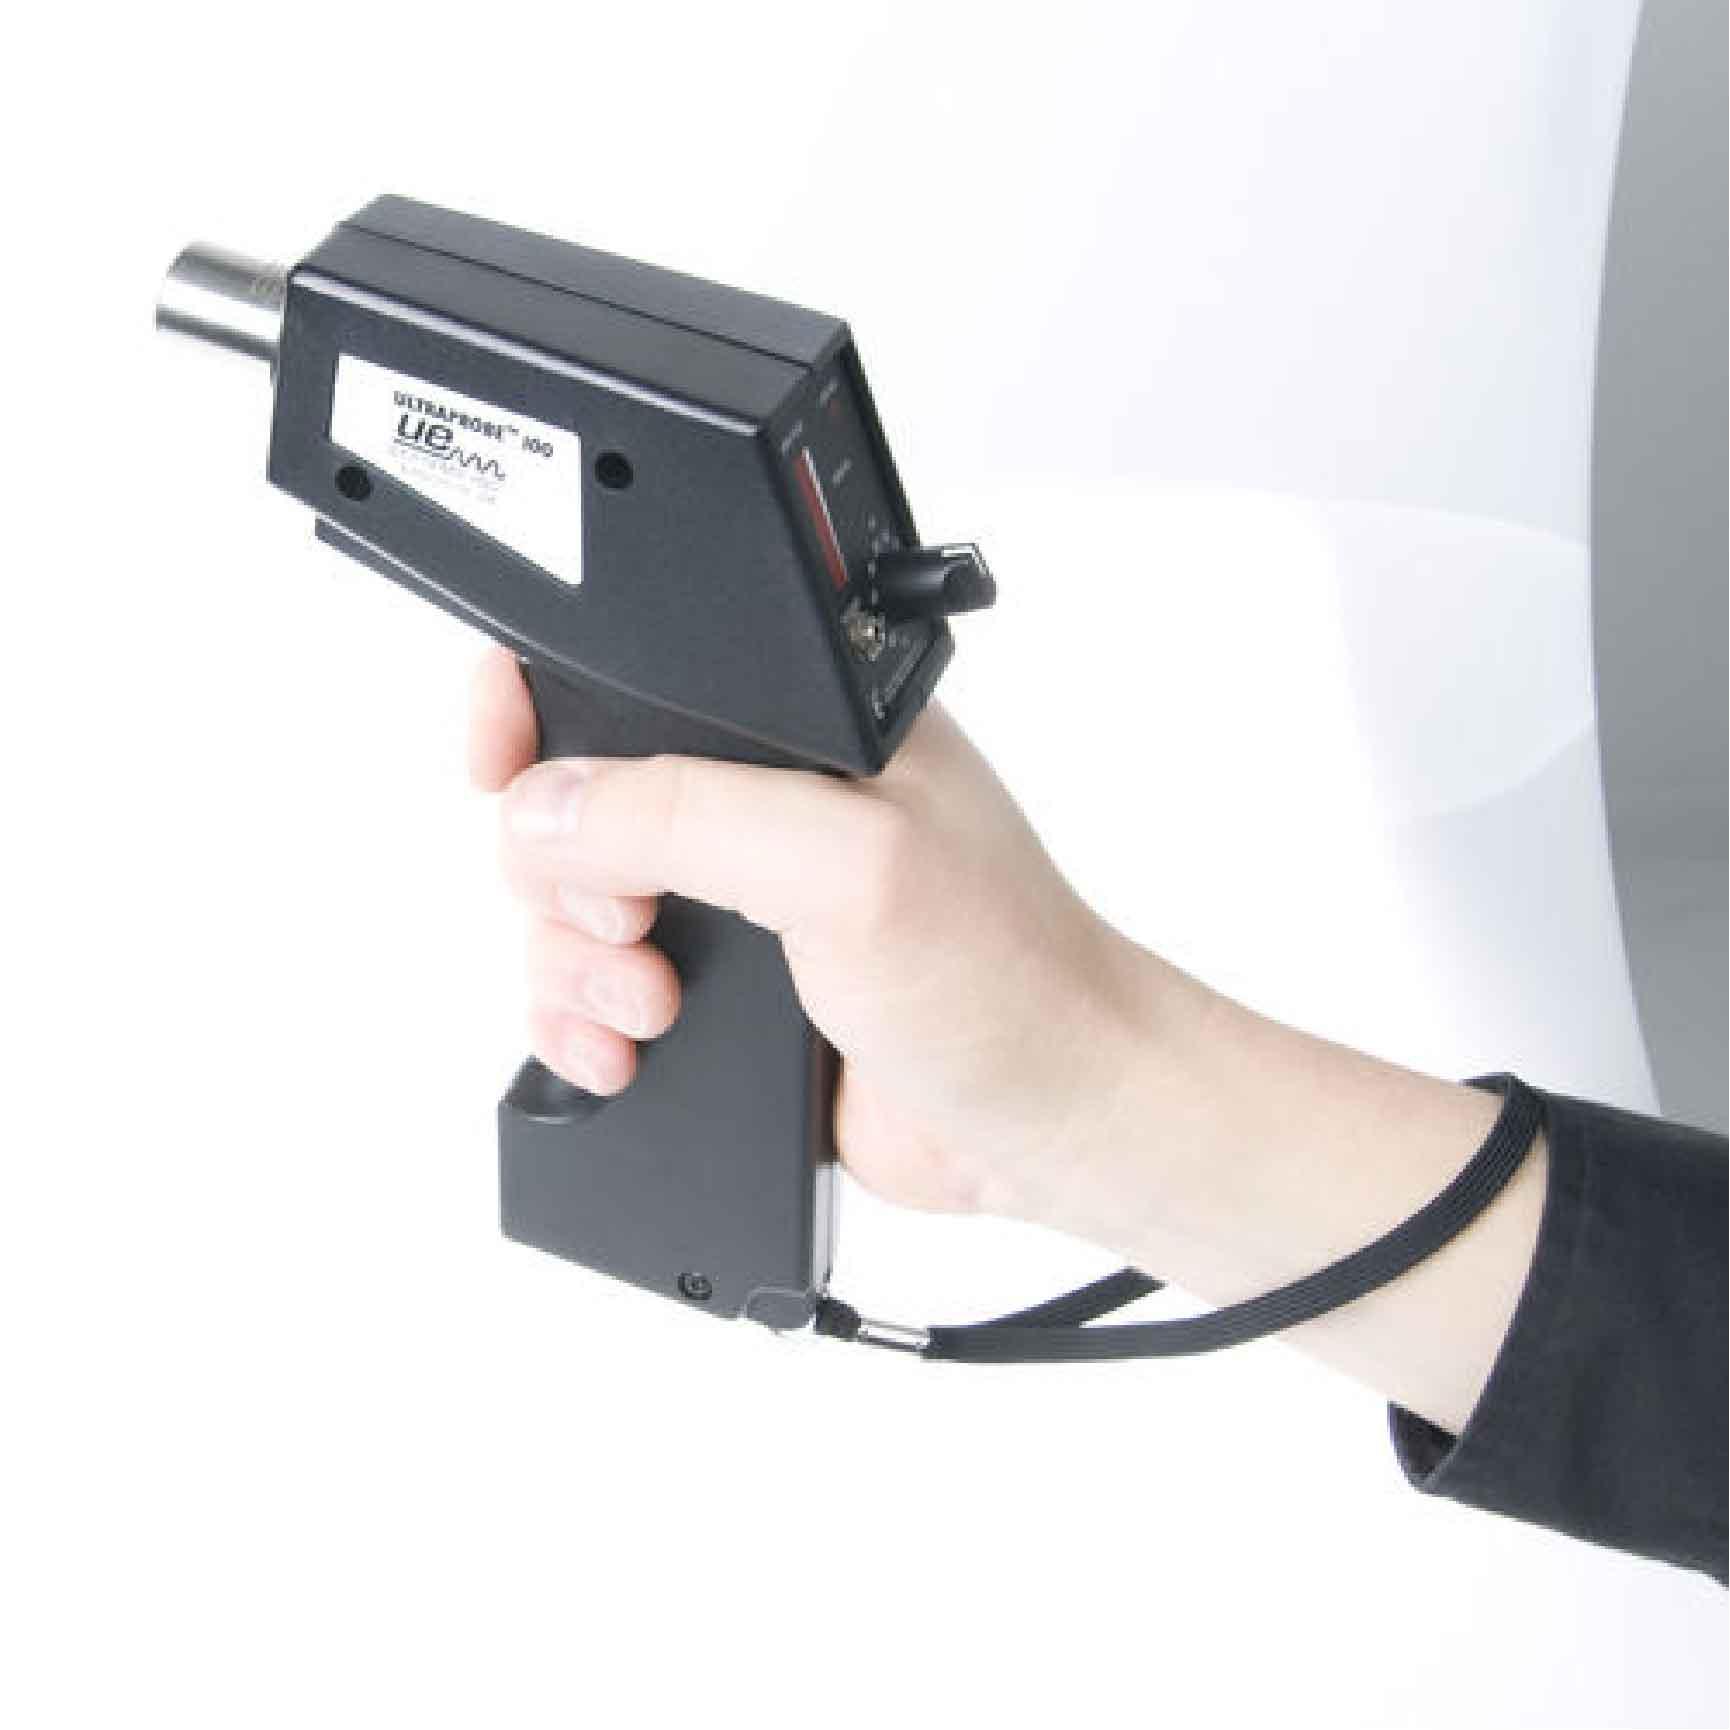 UE SYSTEMS - Ultraprobe 100S-P